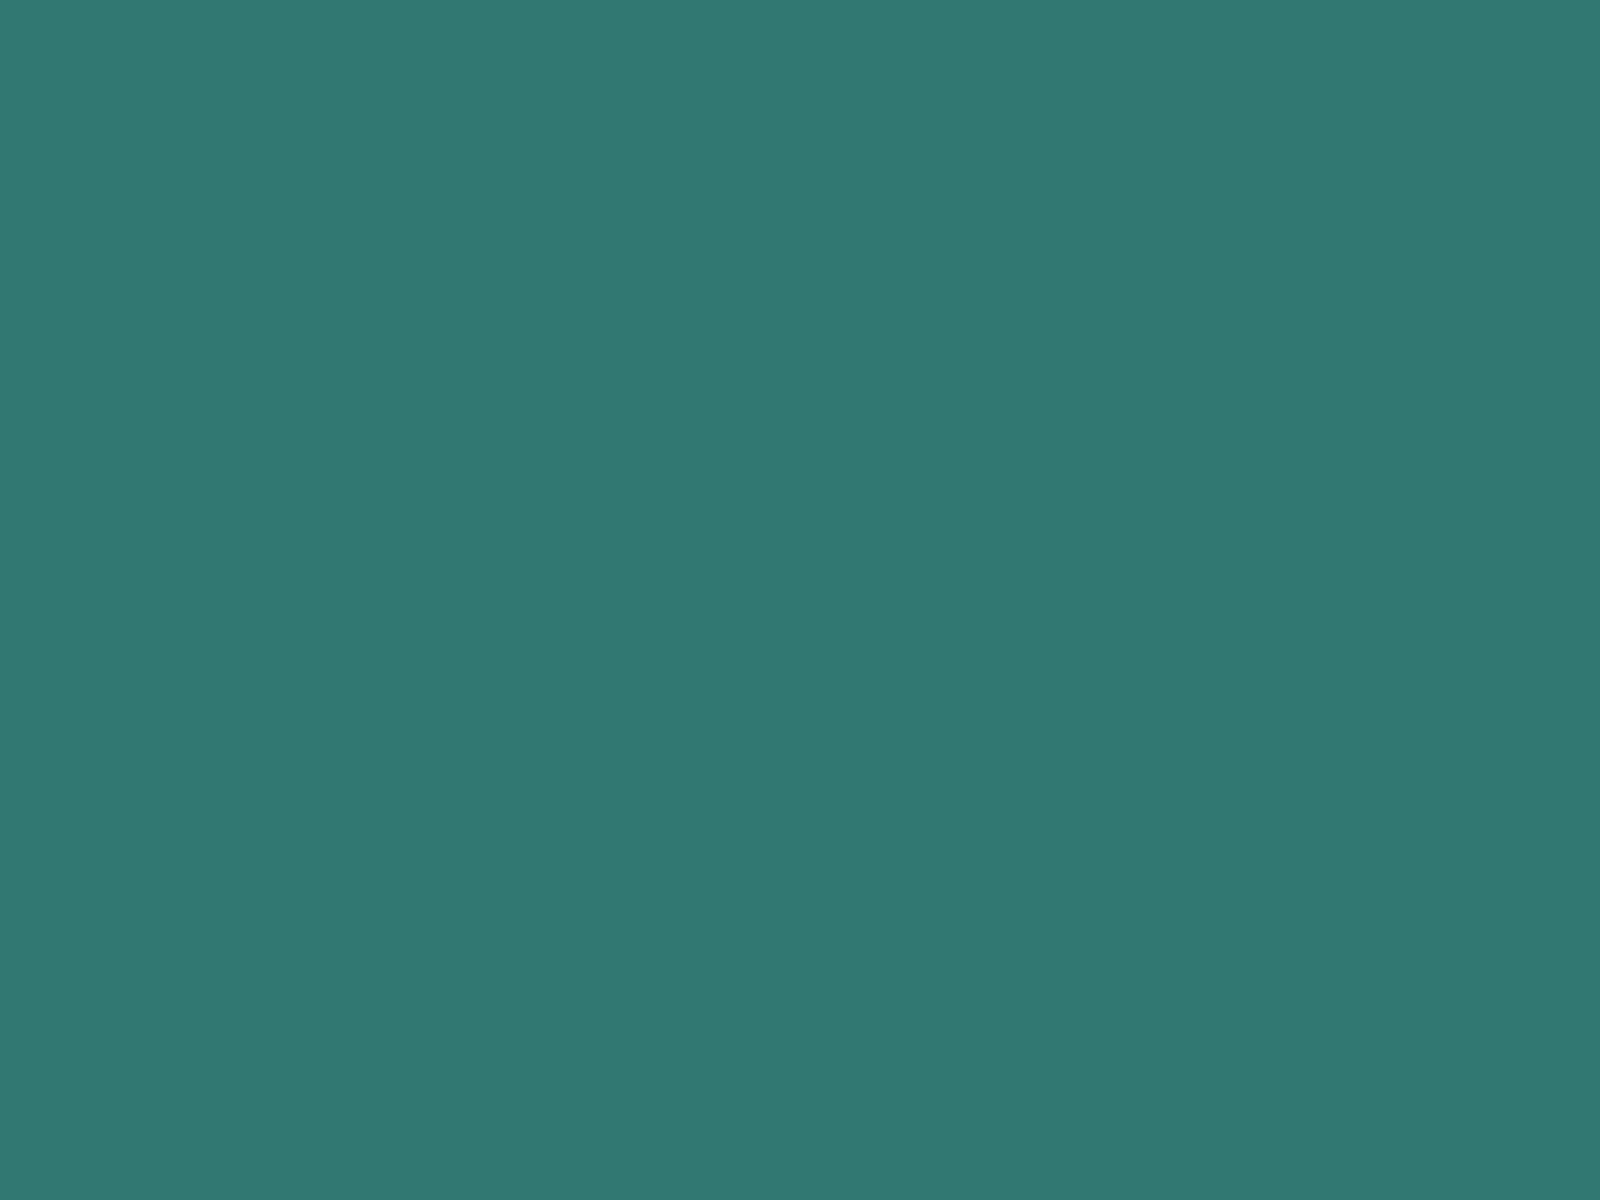 1600x1200 Myrtle Green Solid Color Background